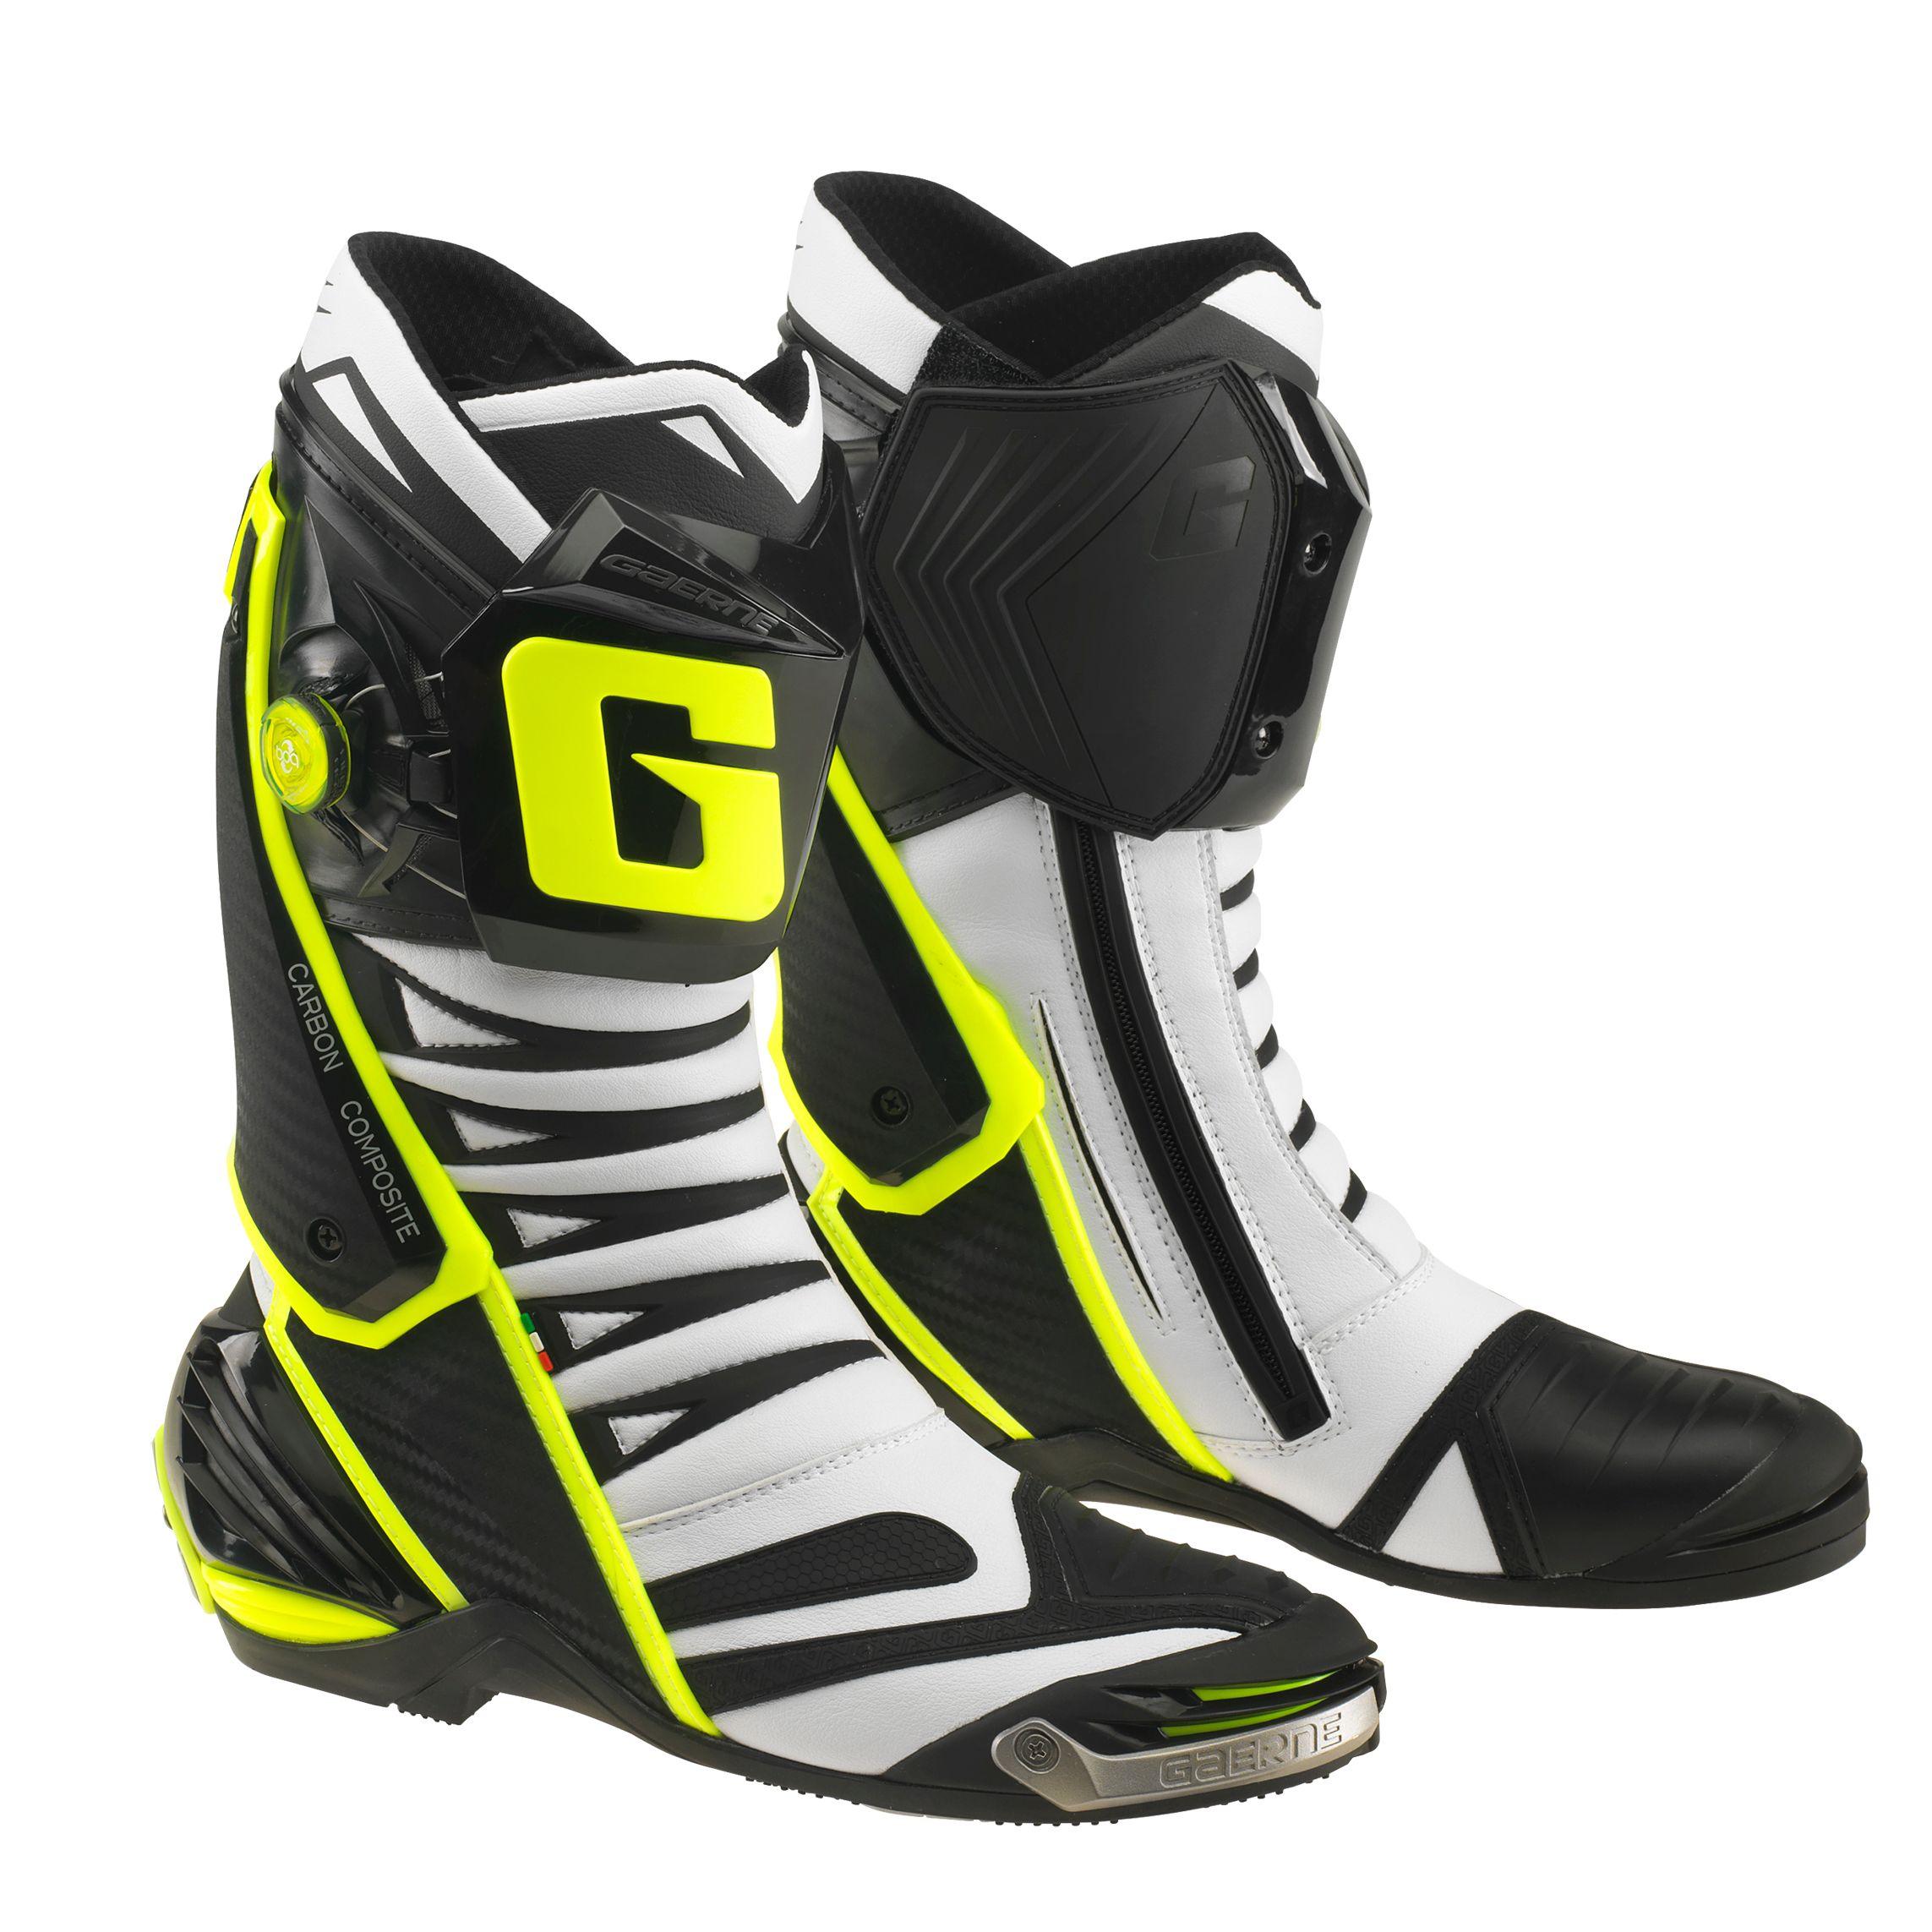 60466294bdacc6 Bottes Gaerne GP1 EVO - Bottes et chaussures - Motoblouz.com